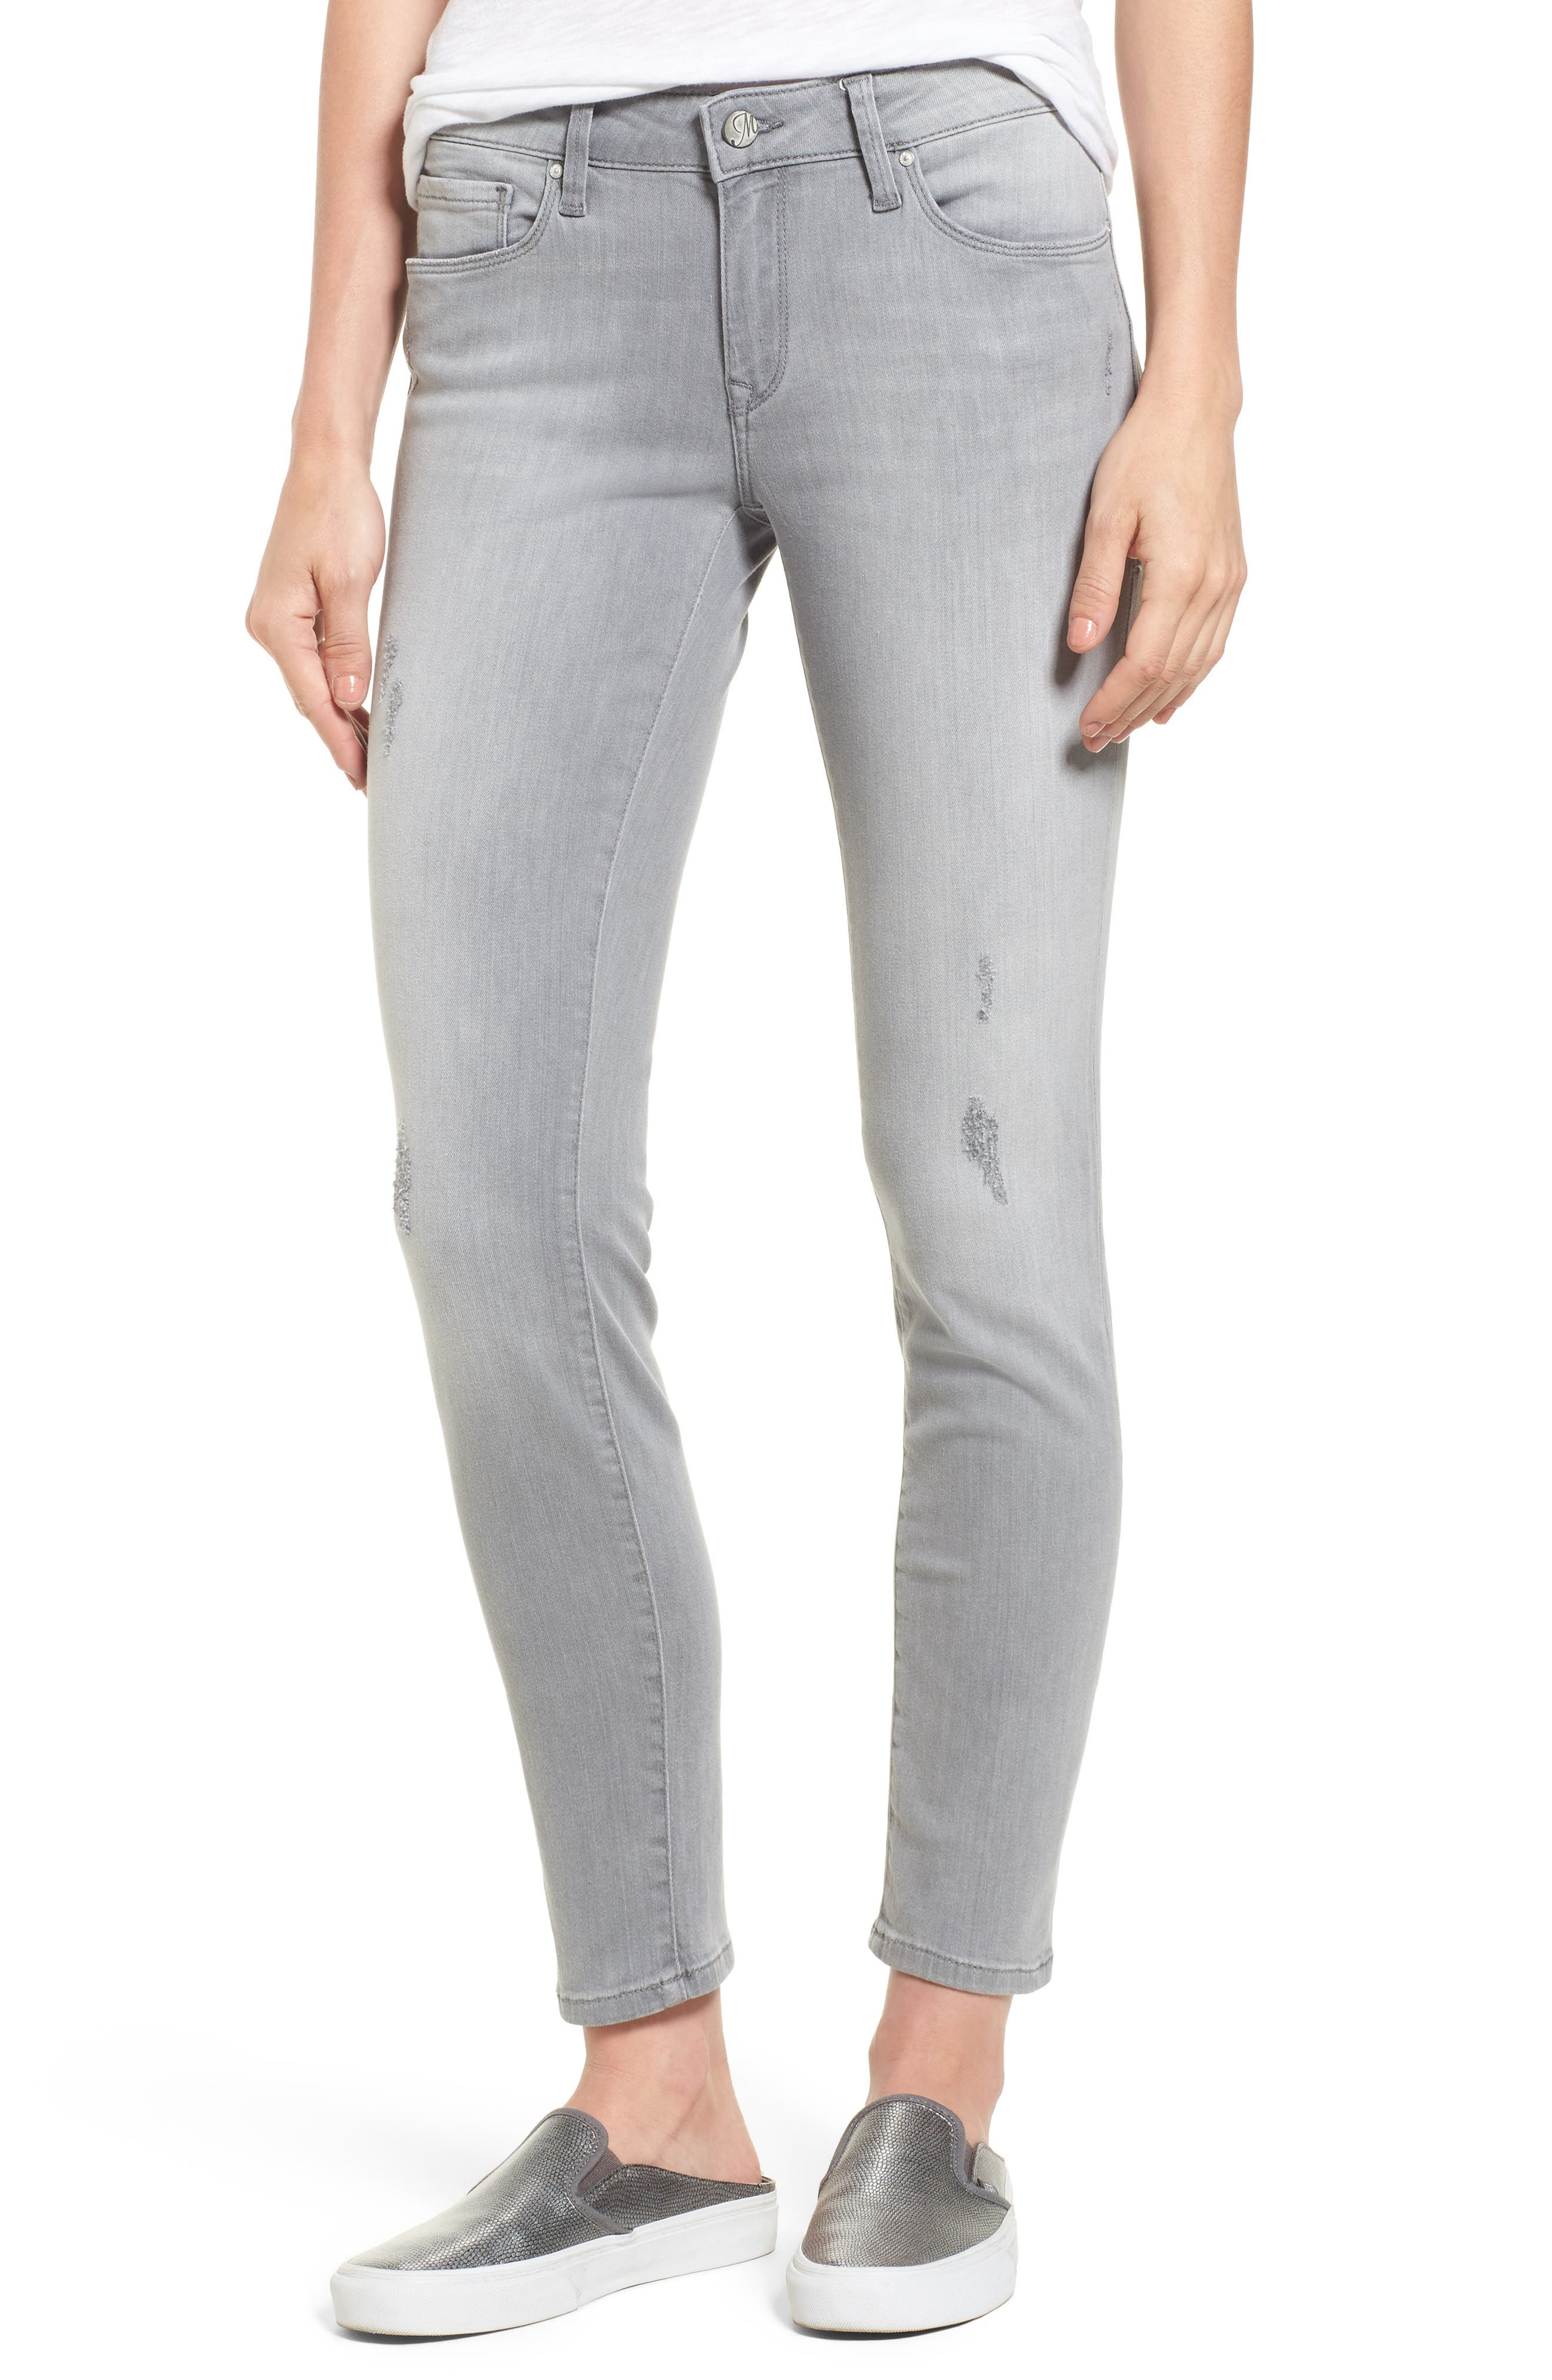 Mavi Jeans Adriana Stretch Skinny Ankle Jeans (Light Grey Tribecca)